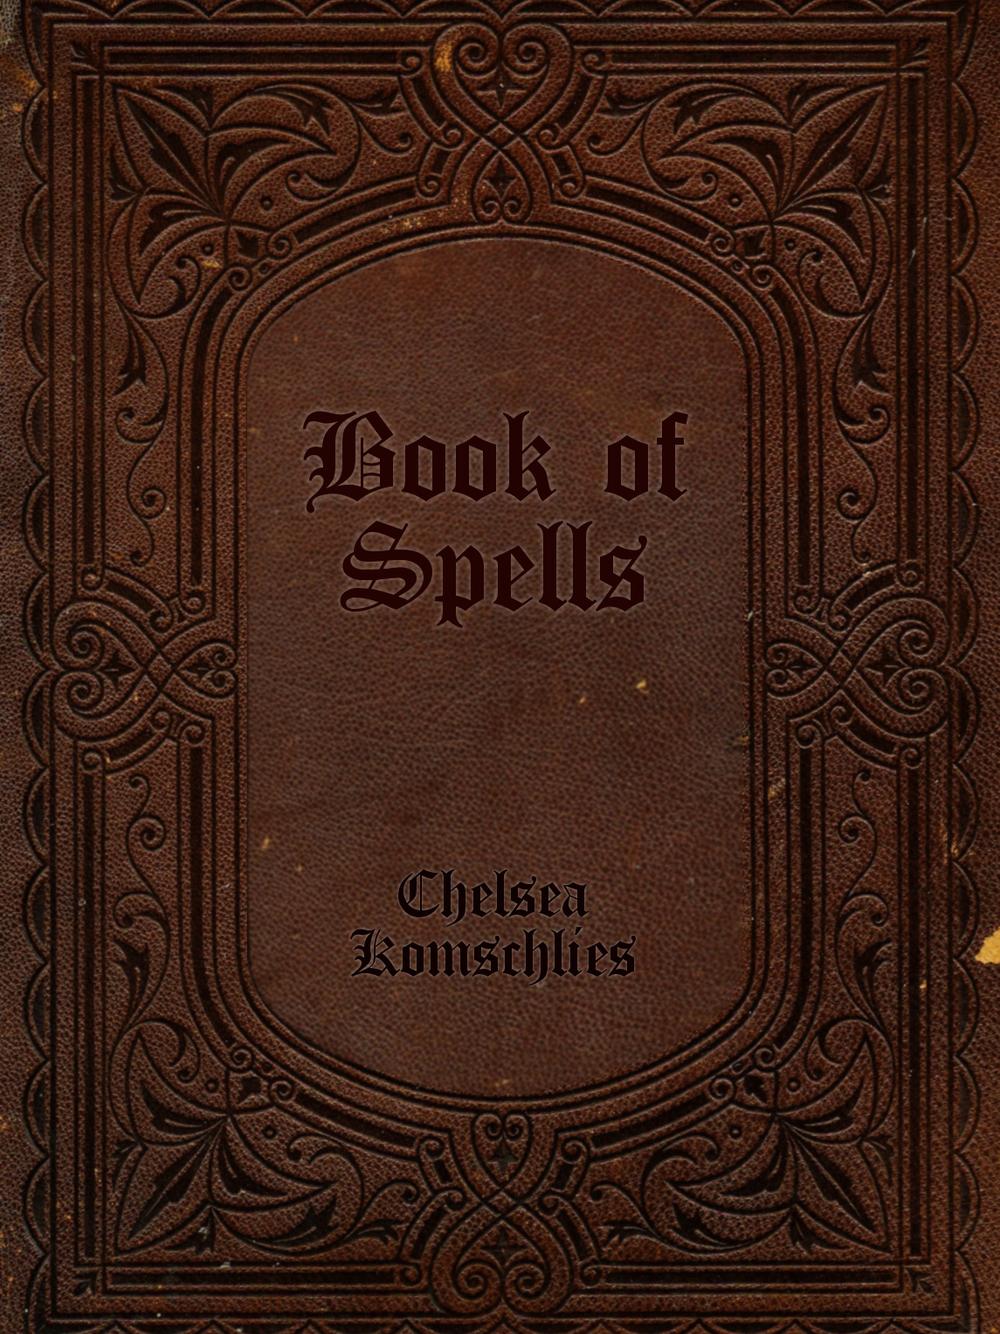 Chelsea_Komschlies_Book_of_Spells.jpg